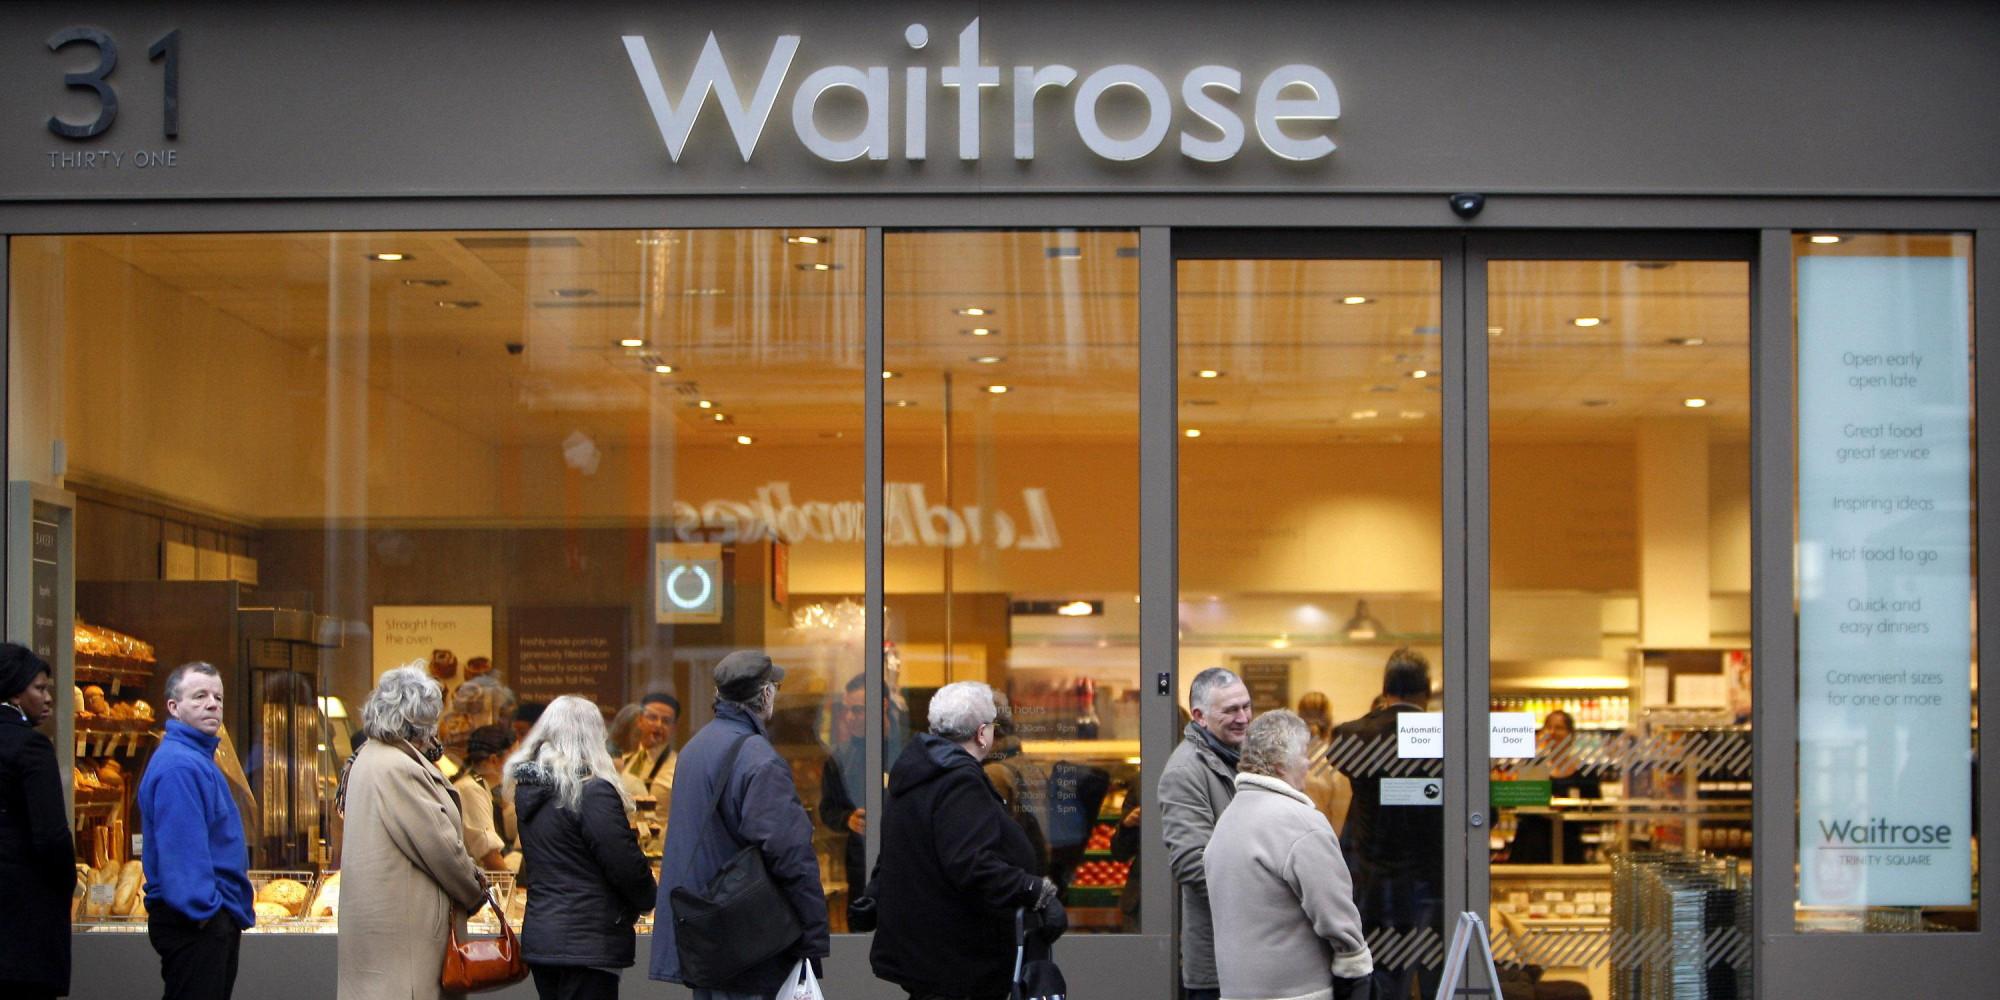 waitrose free coffee or tea scheme 39 draws wrong sort of. Black Bedroom Furniture Sets. Home Design Ideas